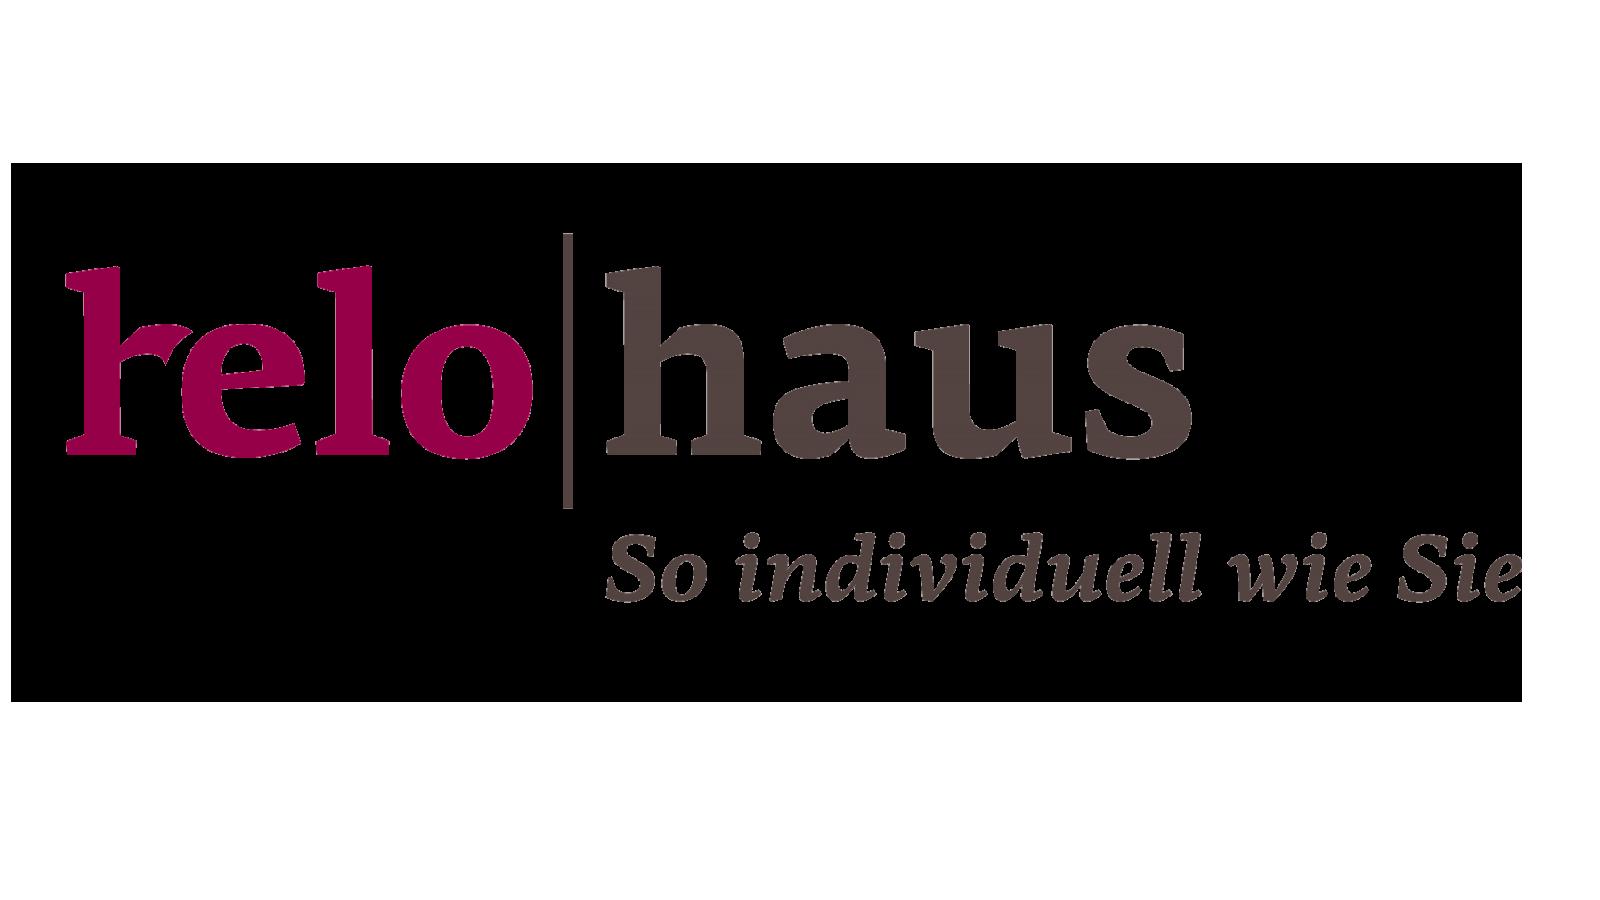 helohaus_1600x900